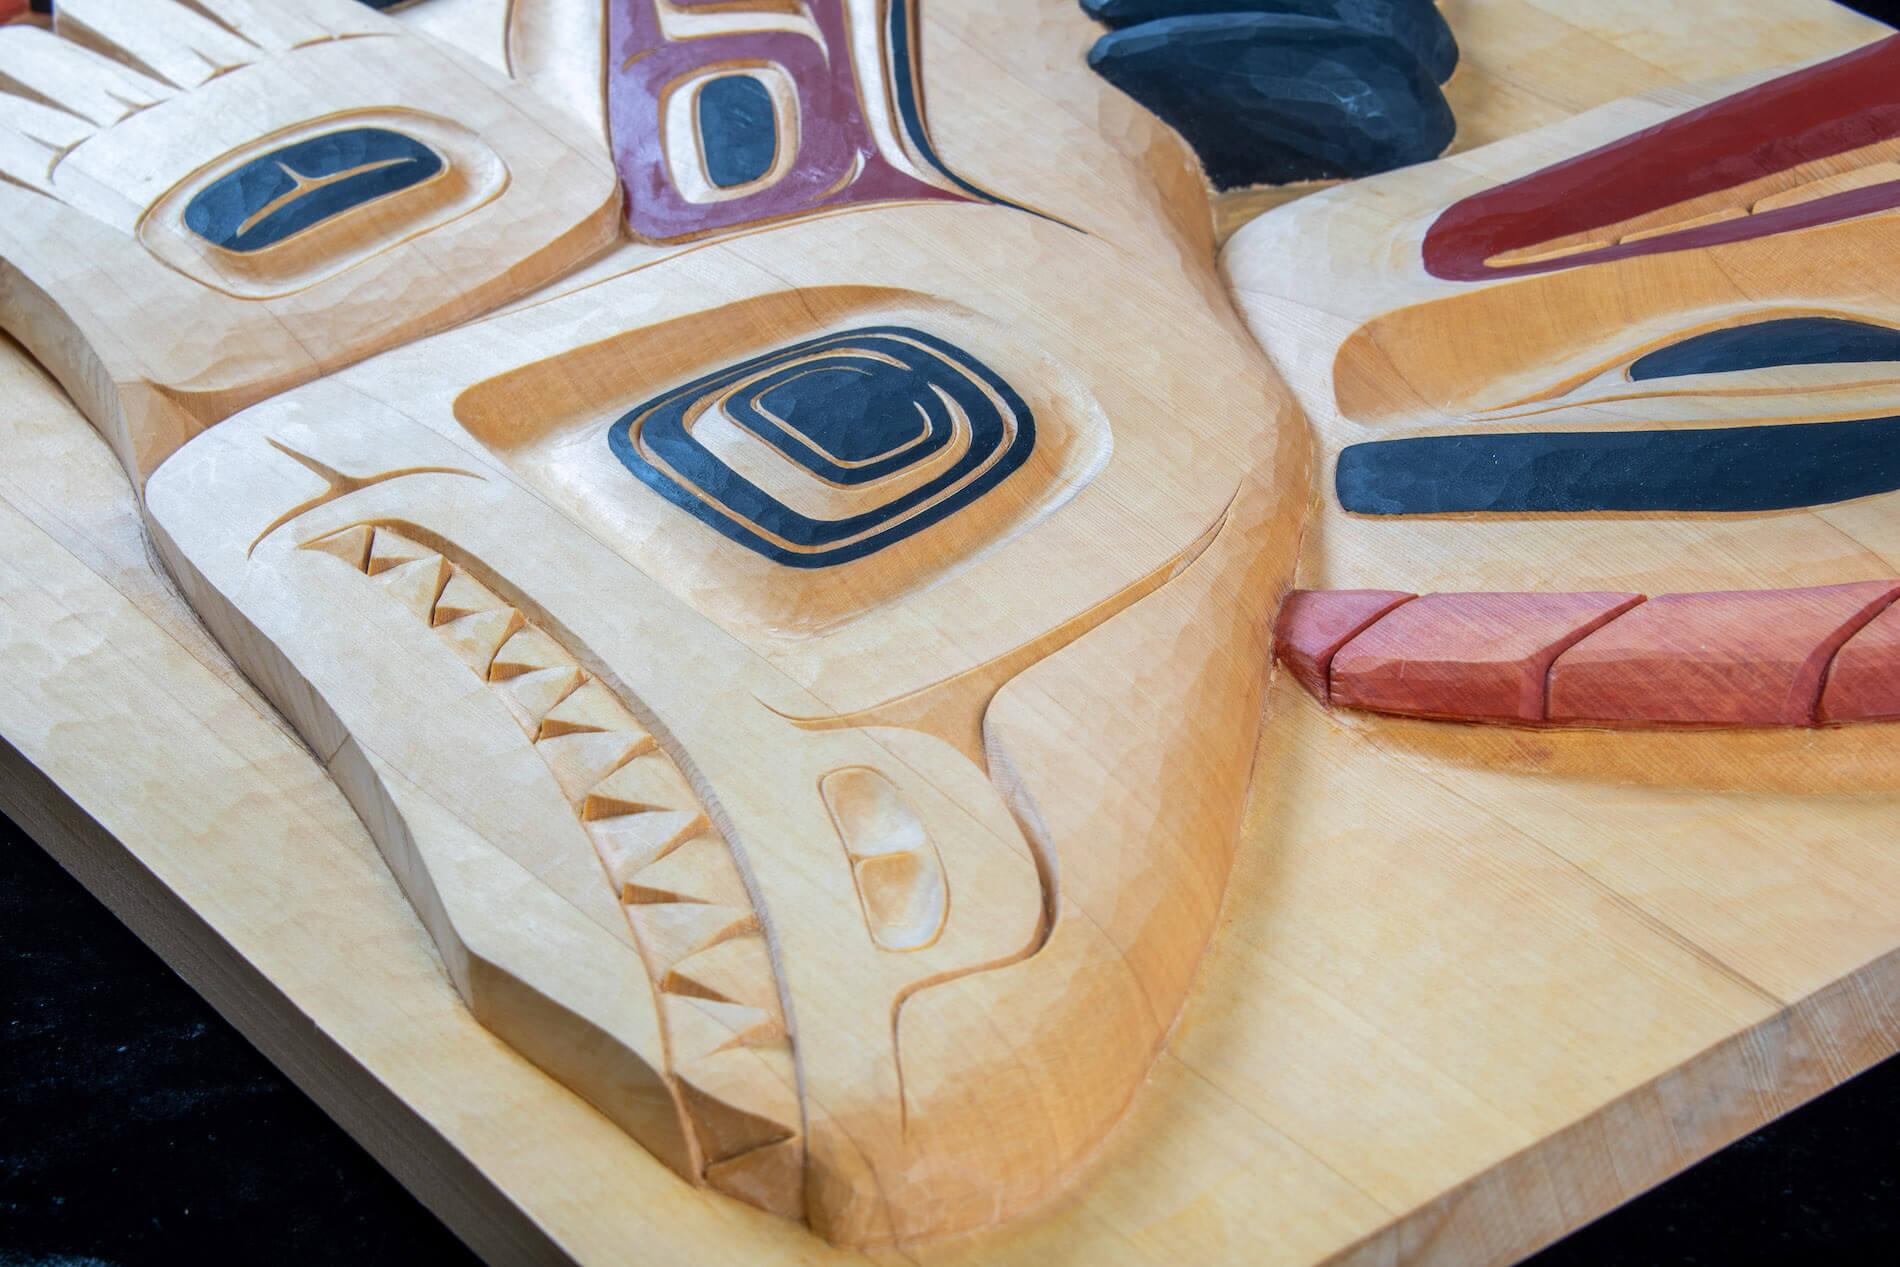 Violet Gatensby Yukon Art Cedar Carving